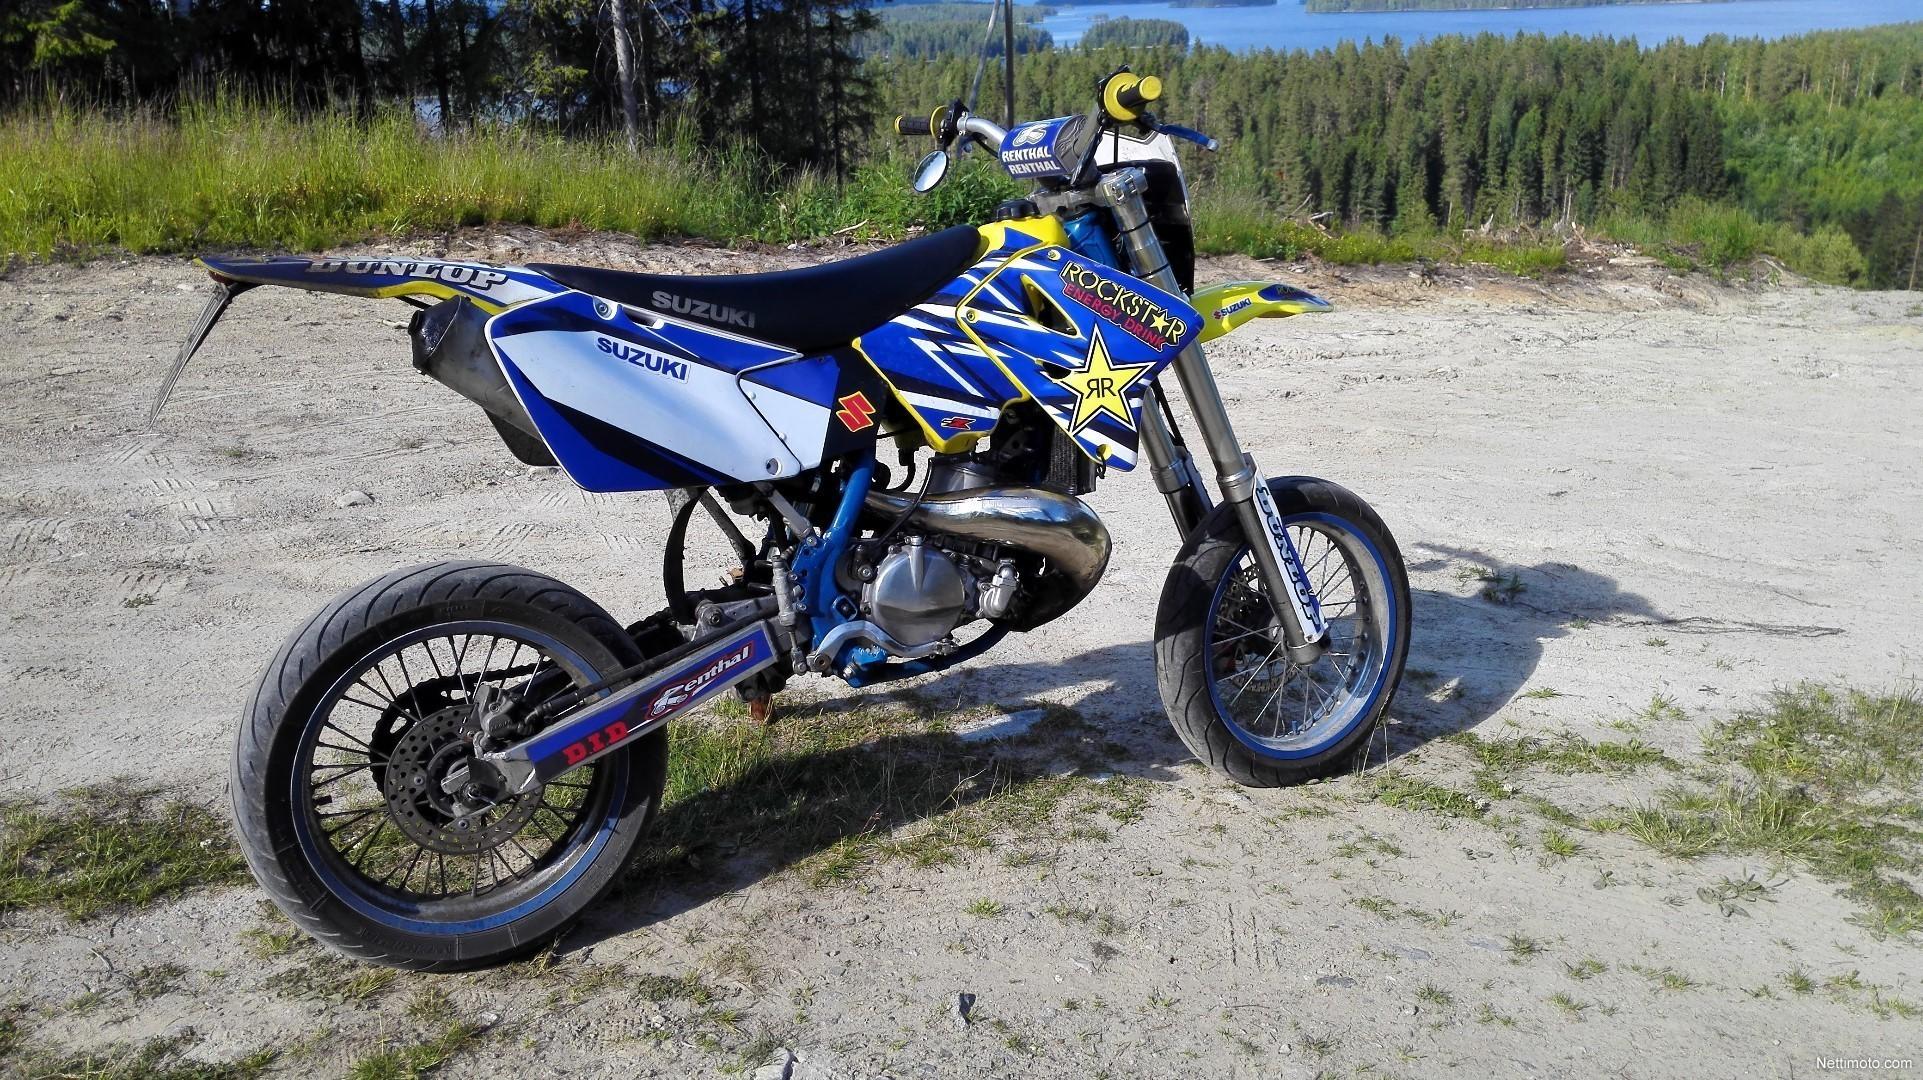 2005 Rmz 250 Supermoto